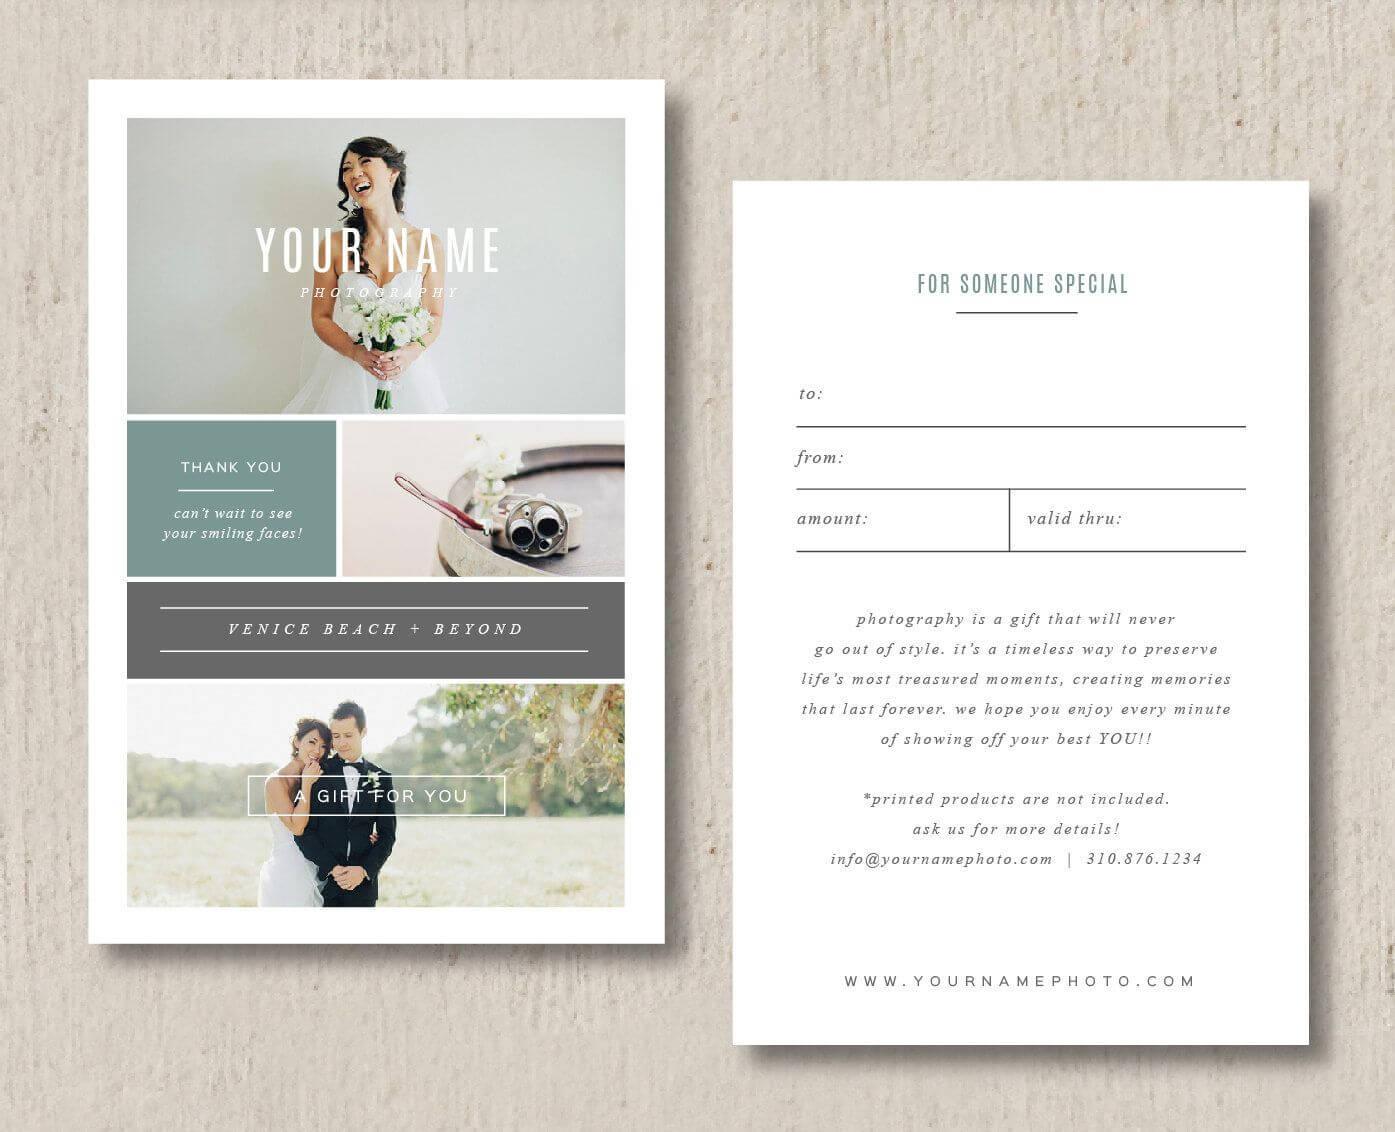 Sale Photographer Gift Card Templatesdesignbybittersweet Regarding Gift Certificate Template Indesign